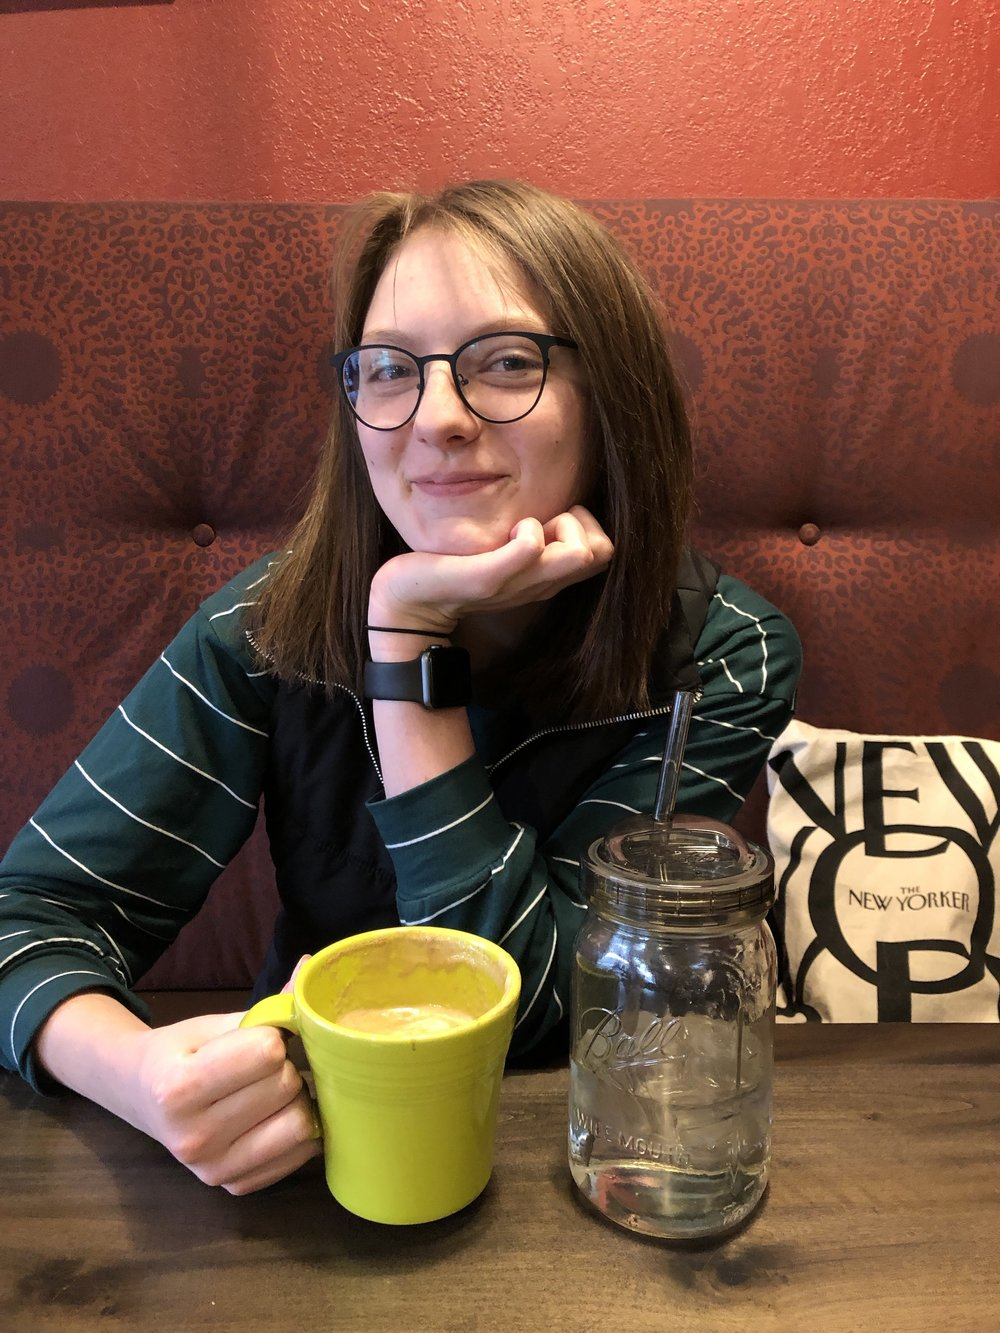 Outgoing Editor-in-Chief Samantha Church